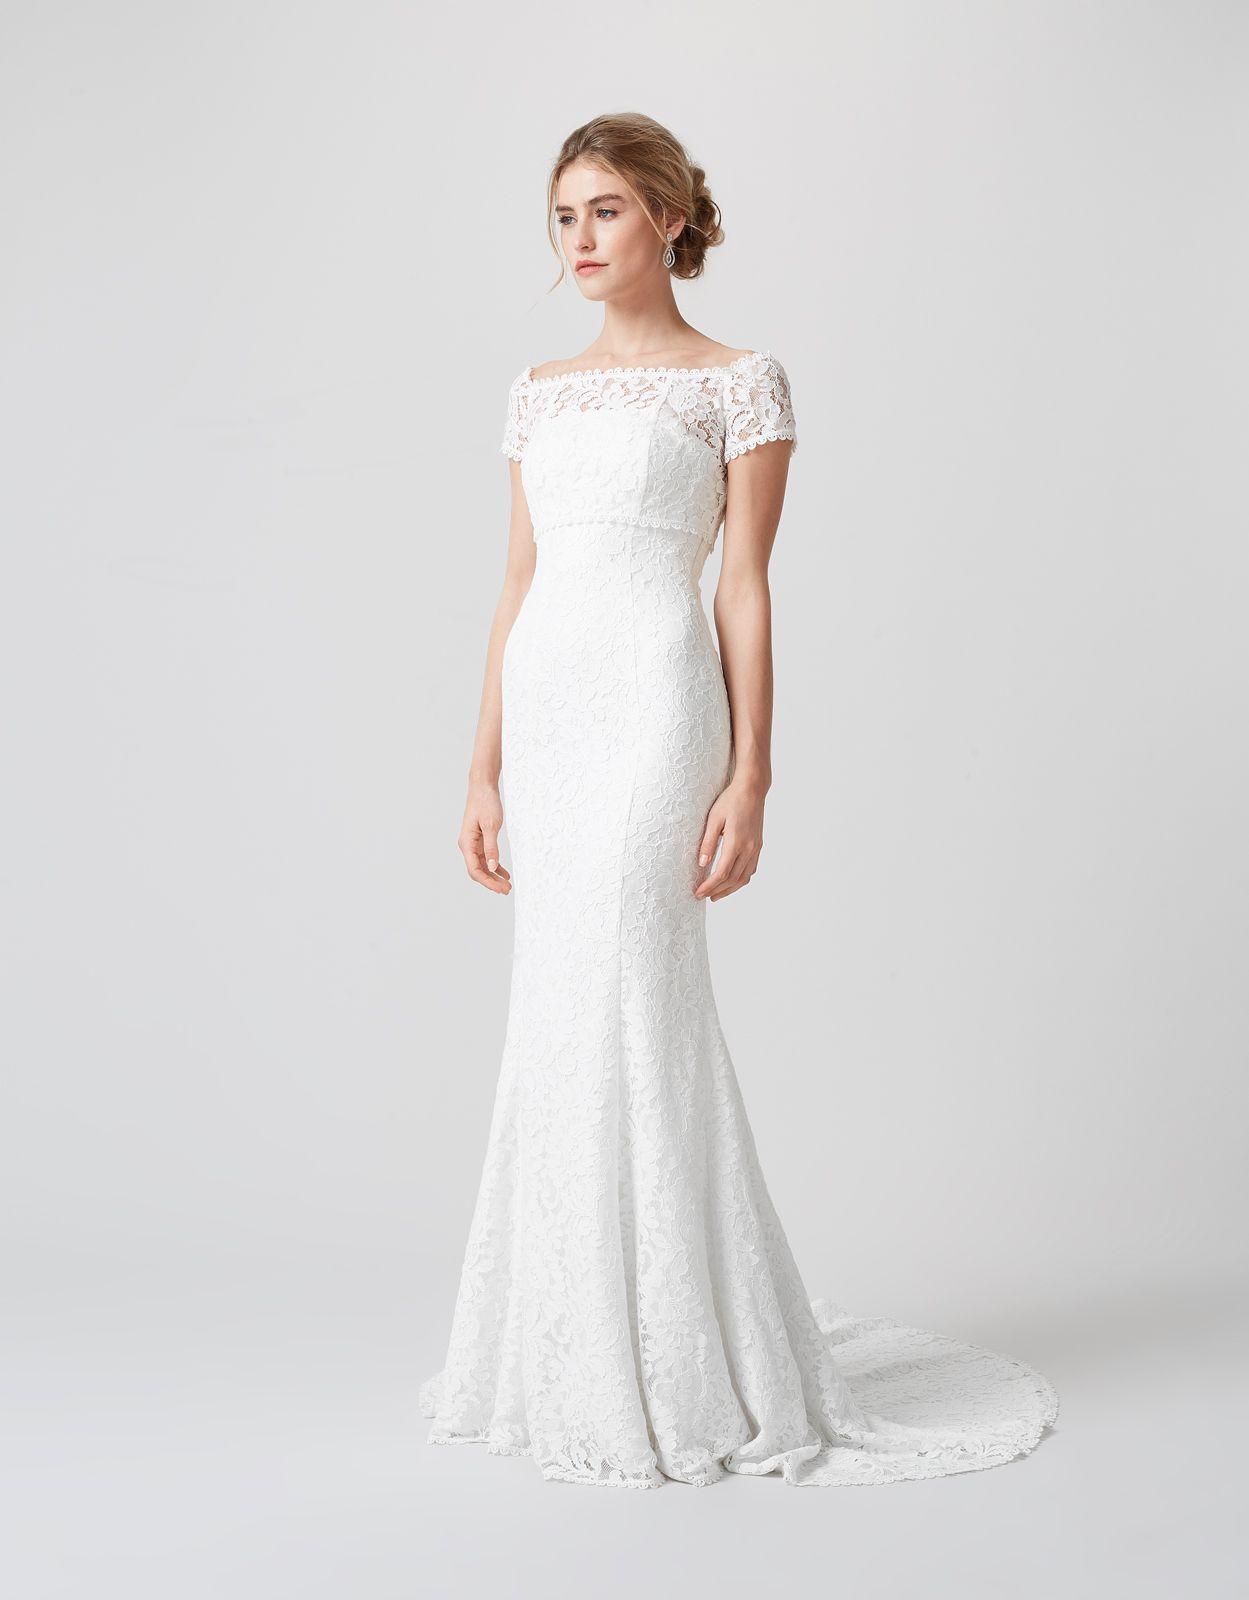 ALEXANDRA LACE BRIDAL DRESS http://www.weddingheart.co.uk/monsoon ...